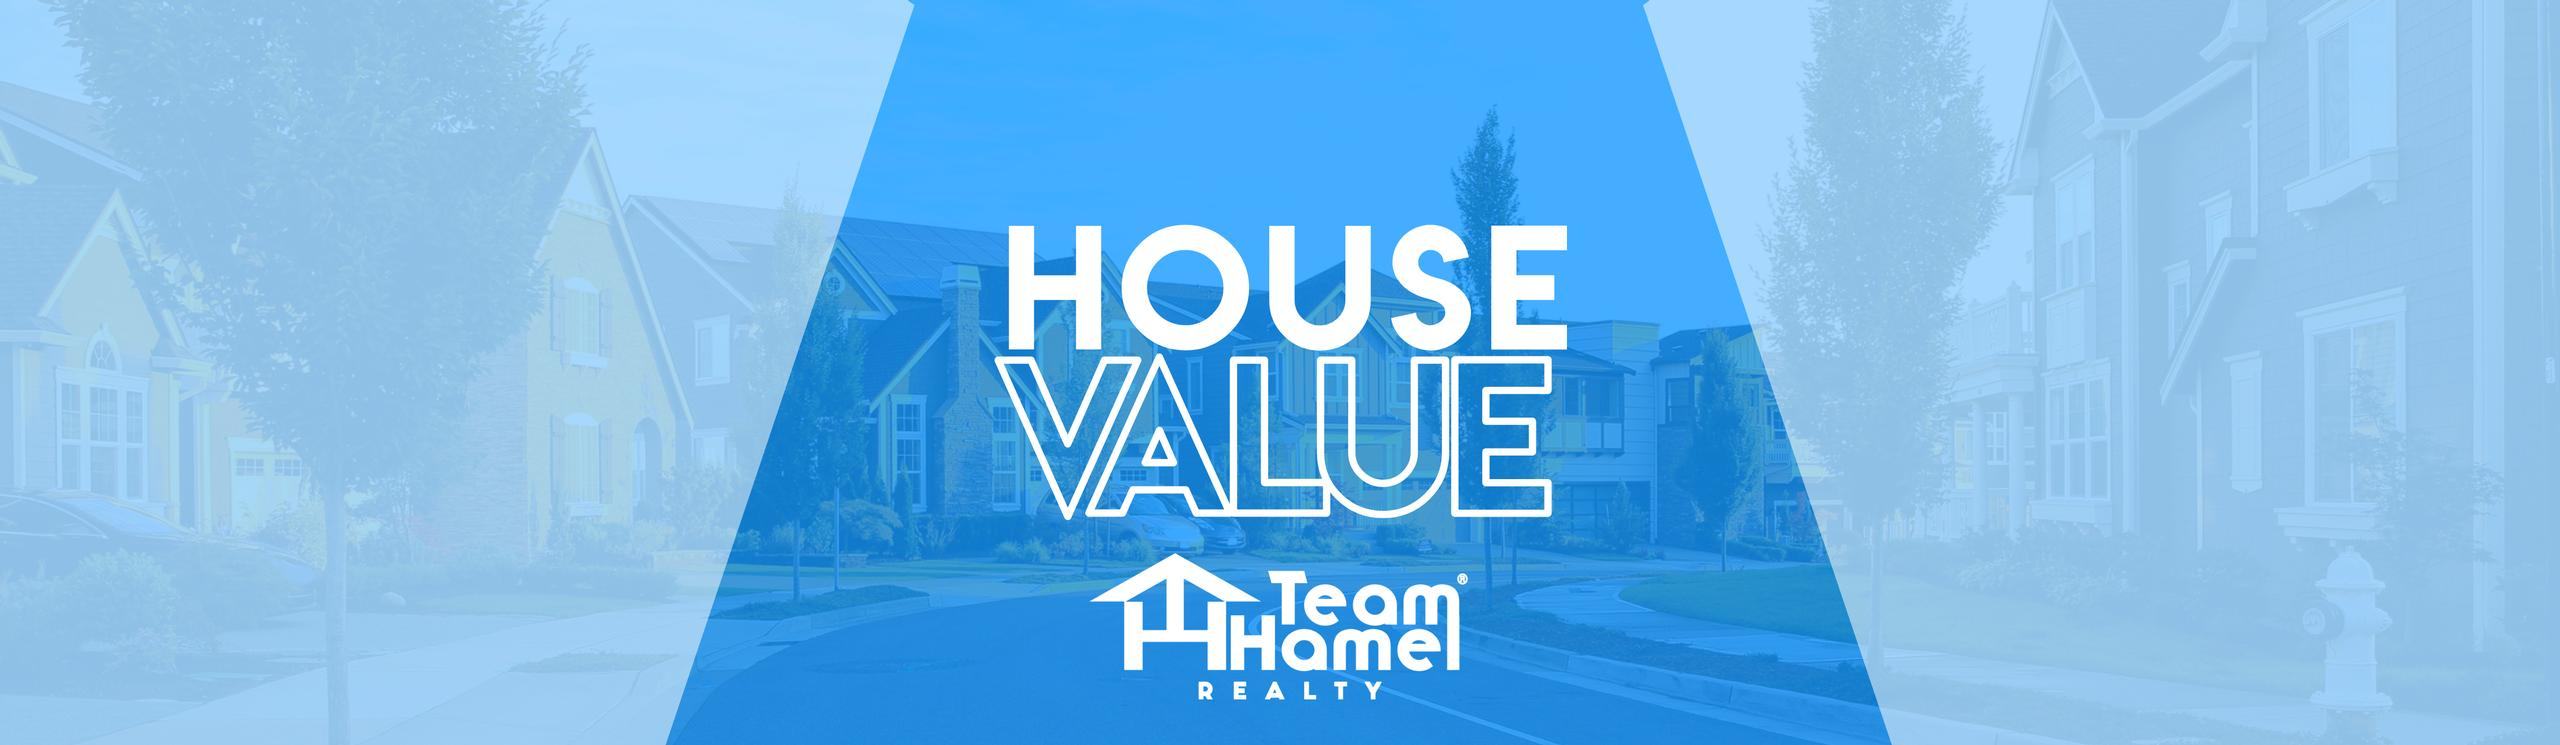 House Value image